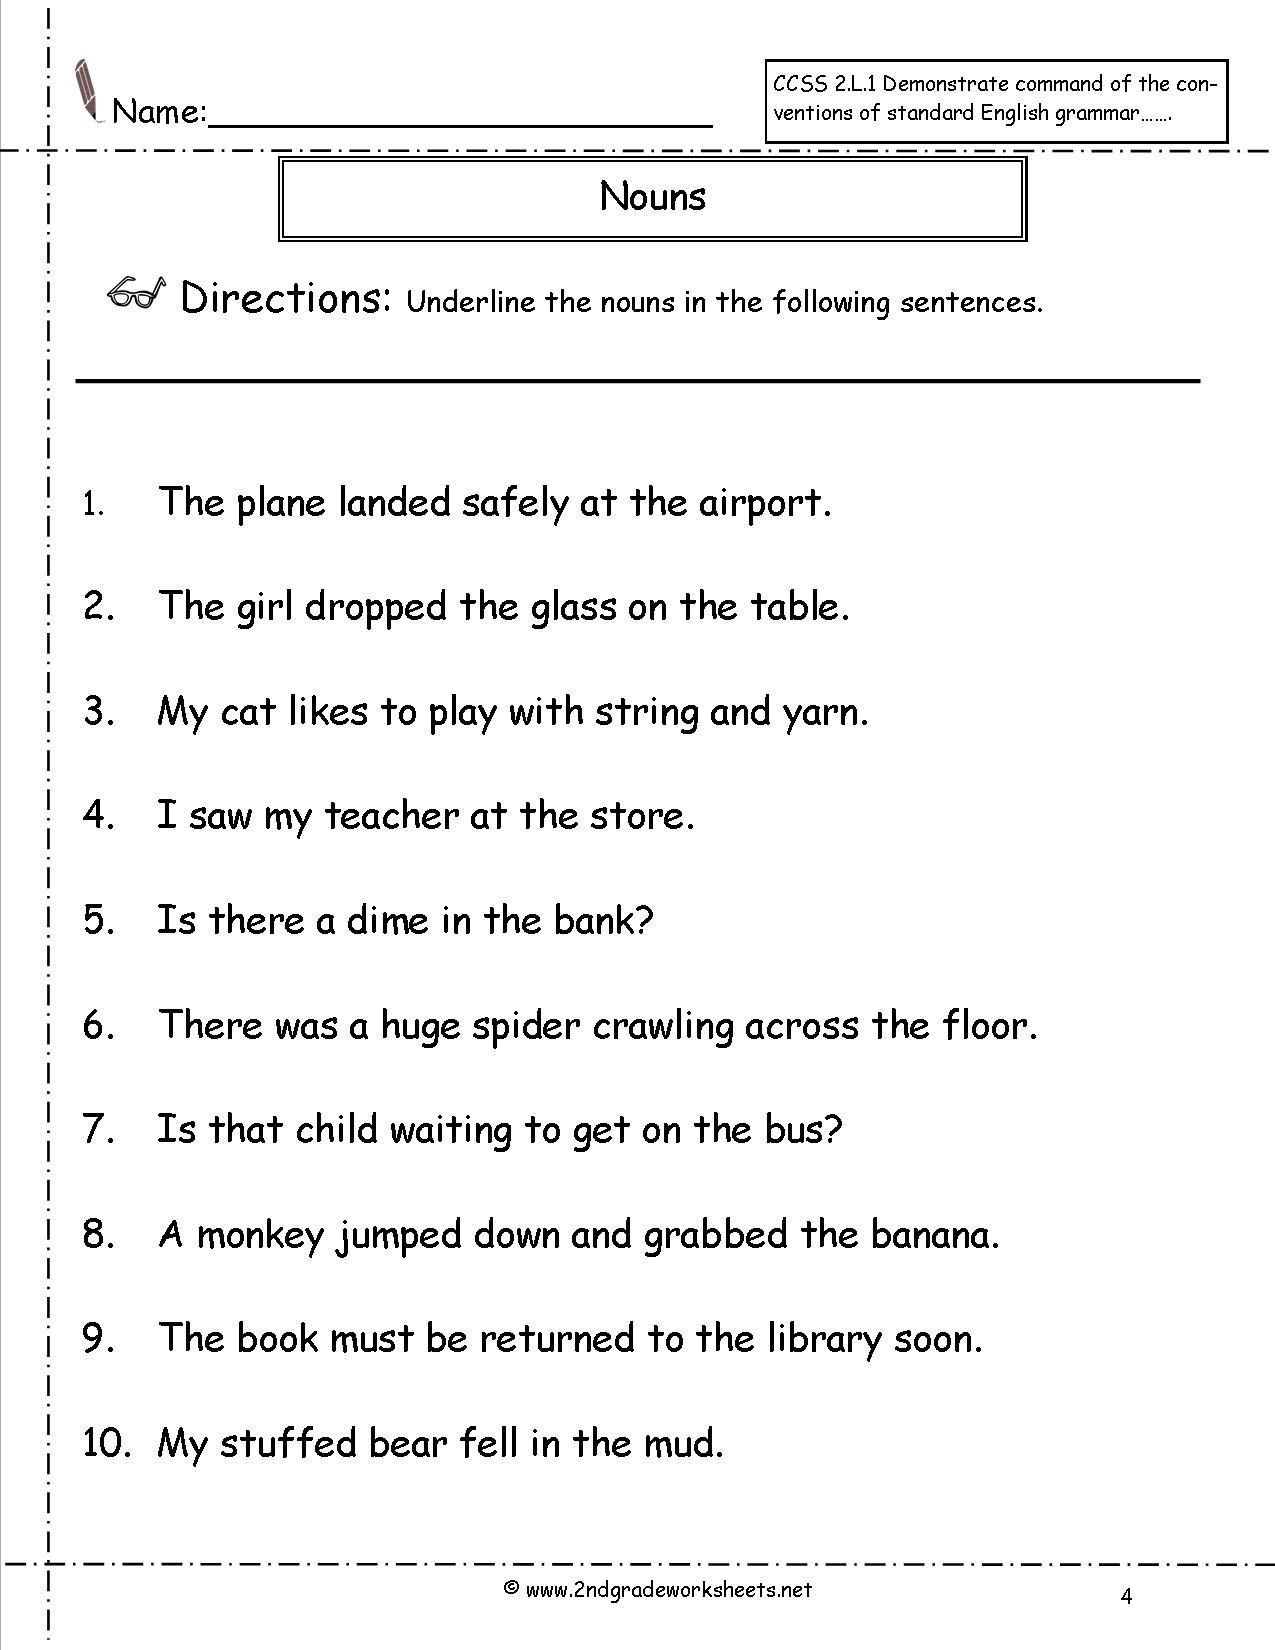 Free Printable Pronoun Worksheets For 2nd Grade